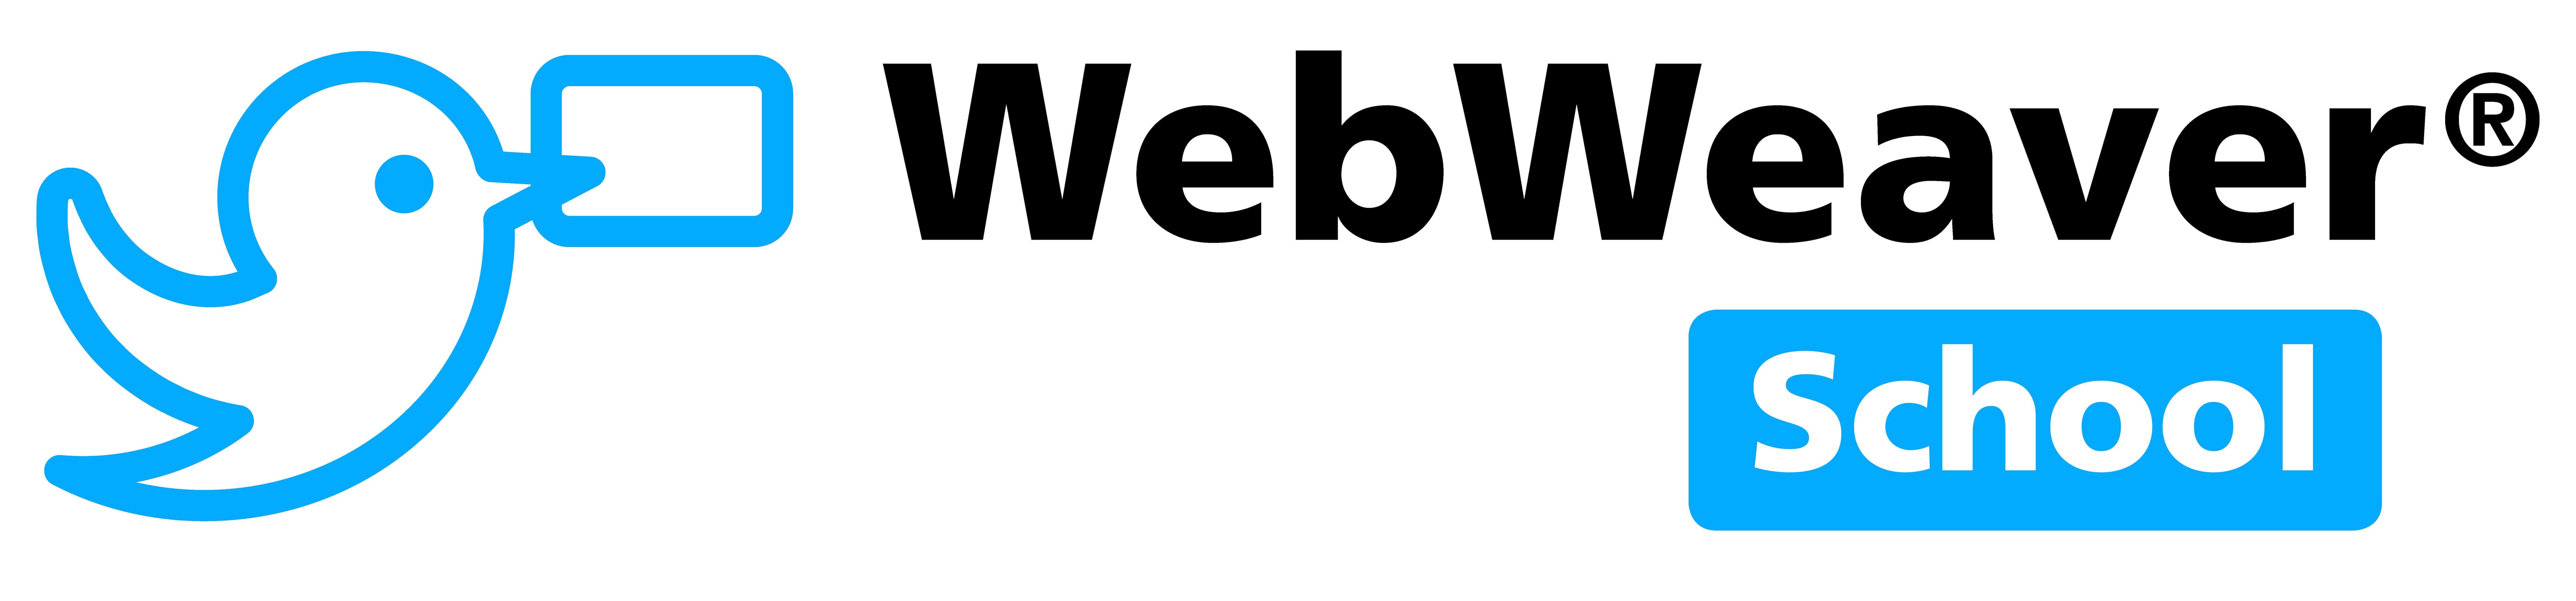 wwschool logo